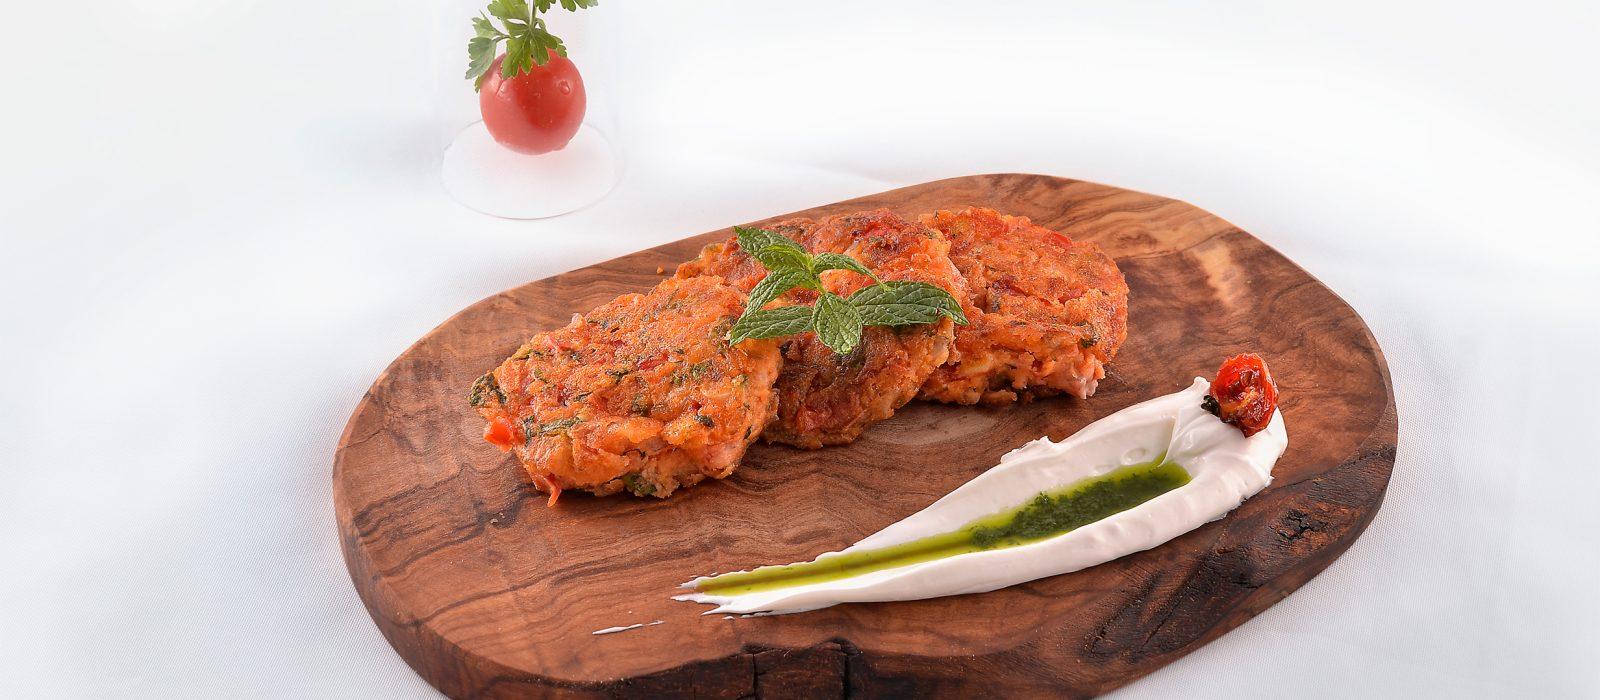 Tomato patties-Ντοματοκεφτέδες